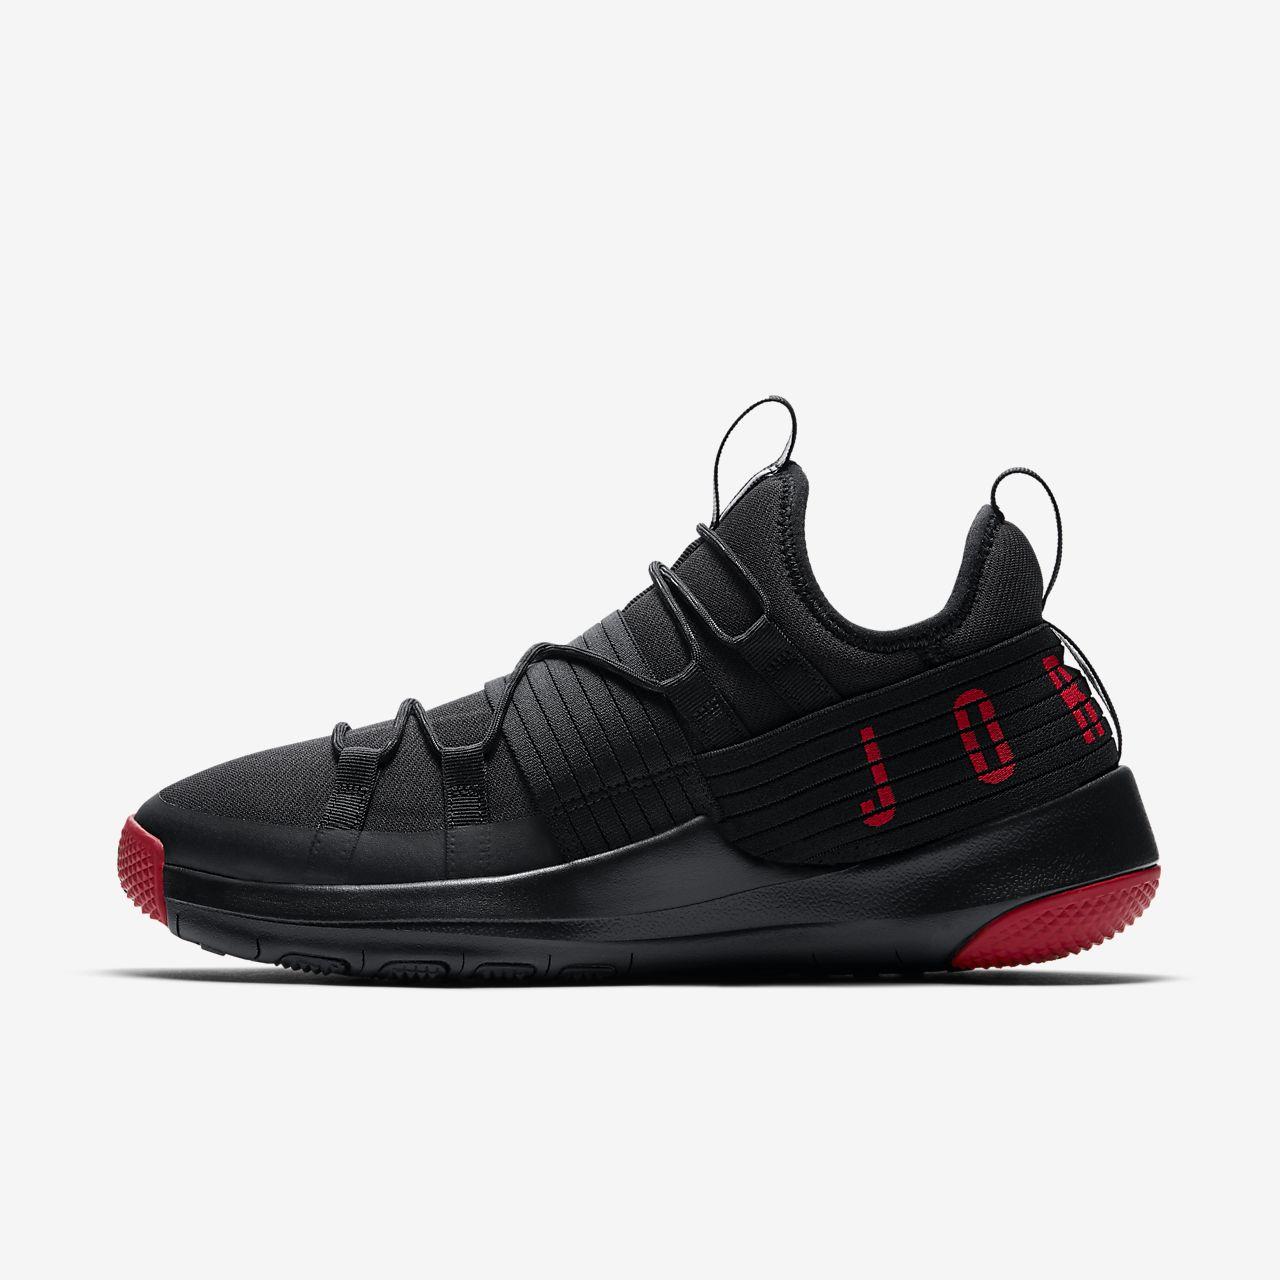 f6256400a7f Jordan Trainer Pro Men s Training Shoe. Nike.com IN